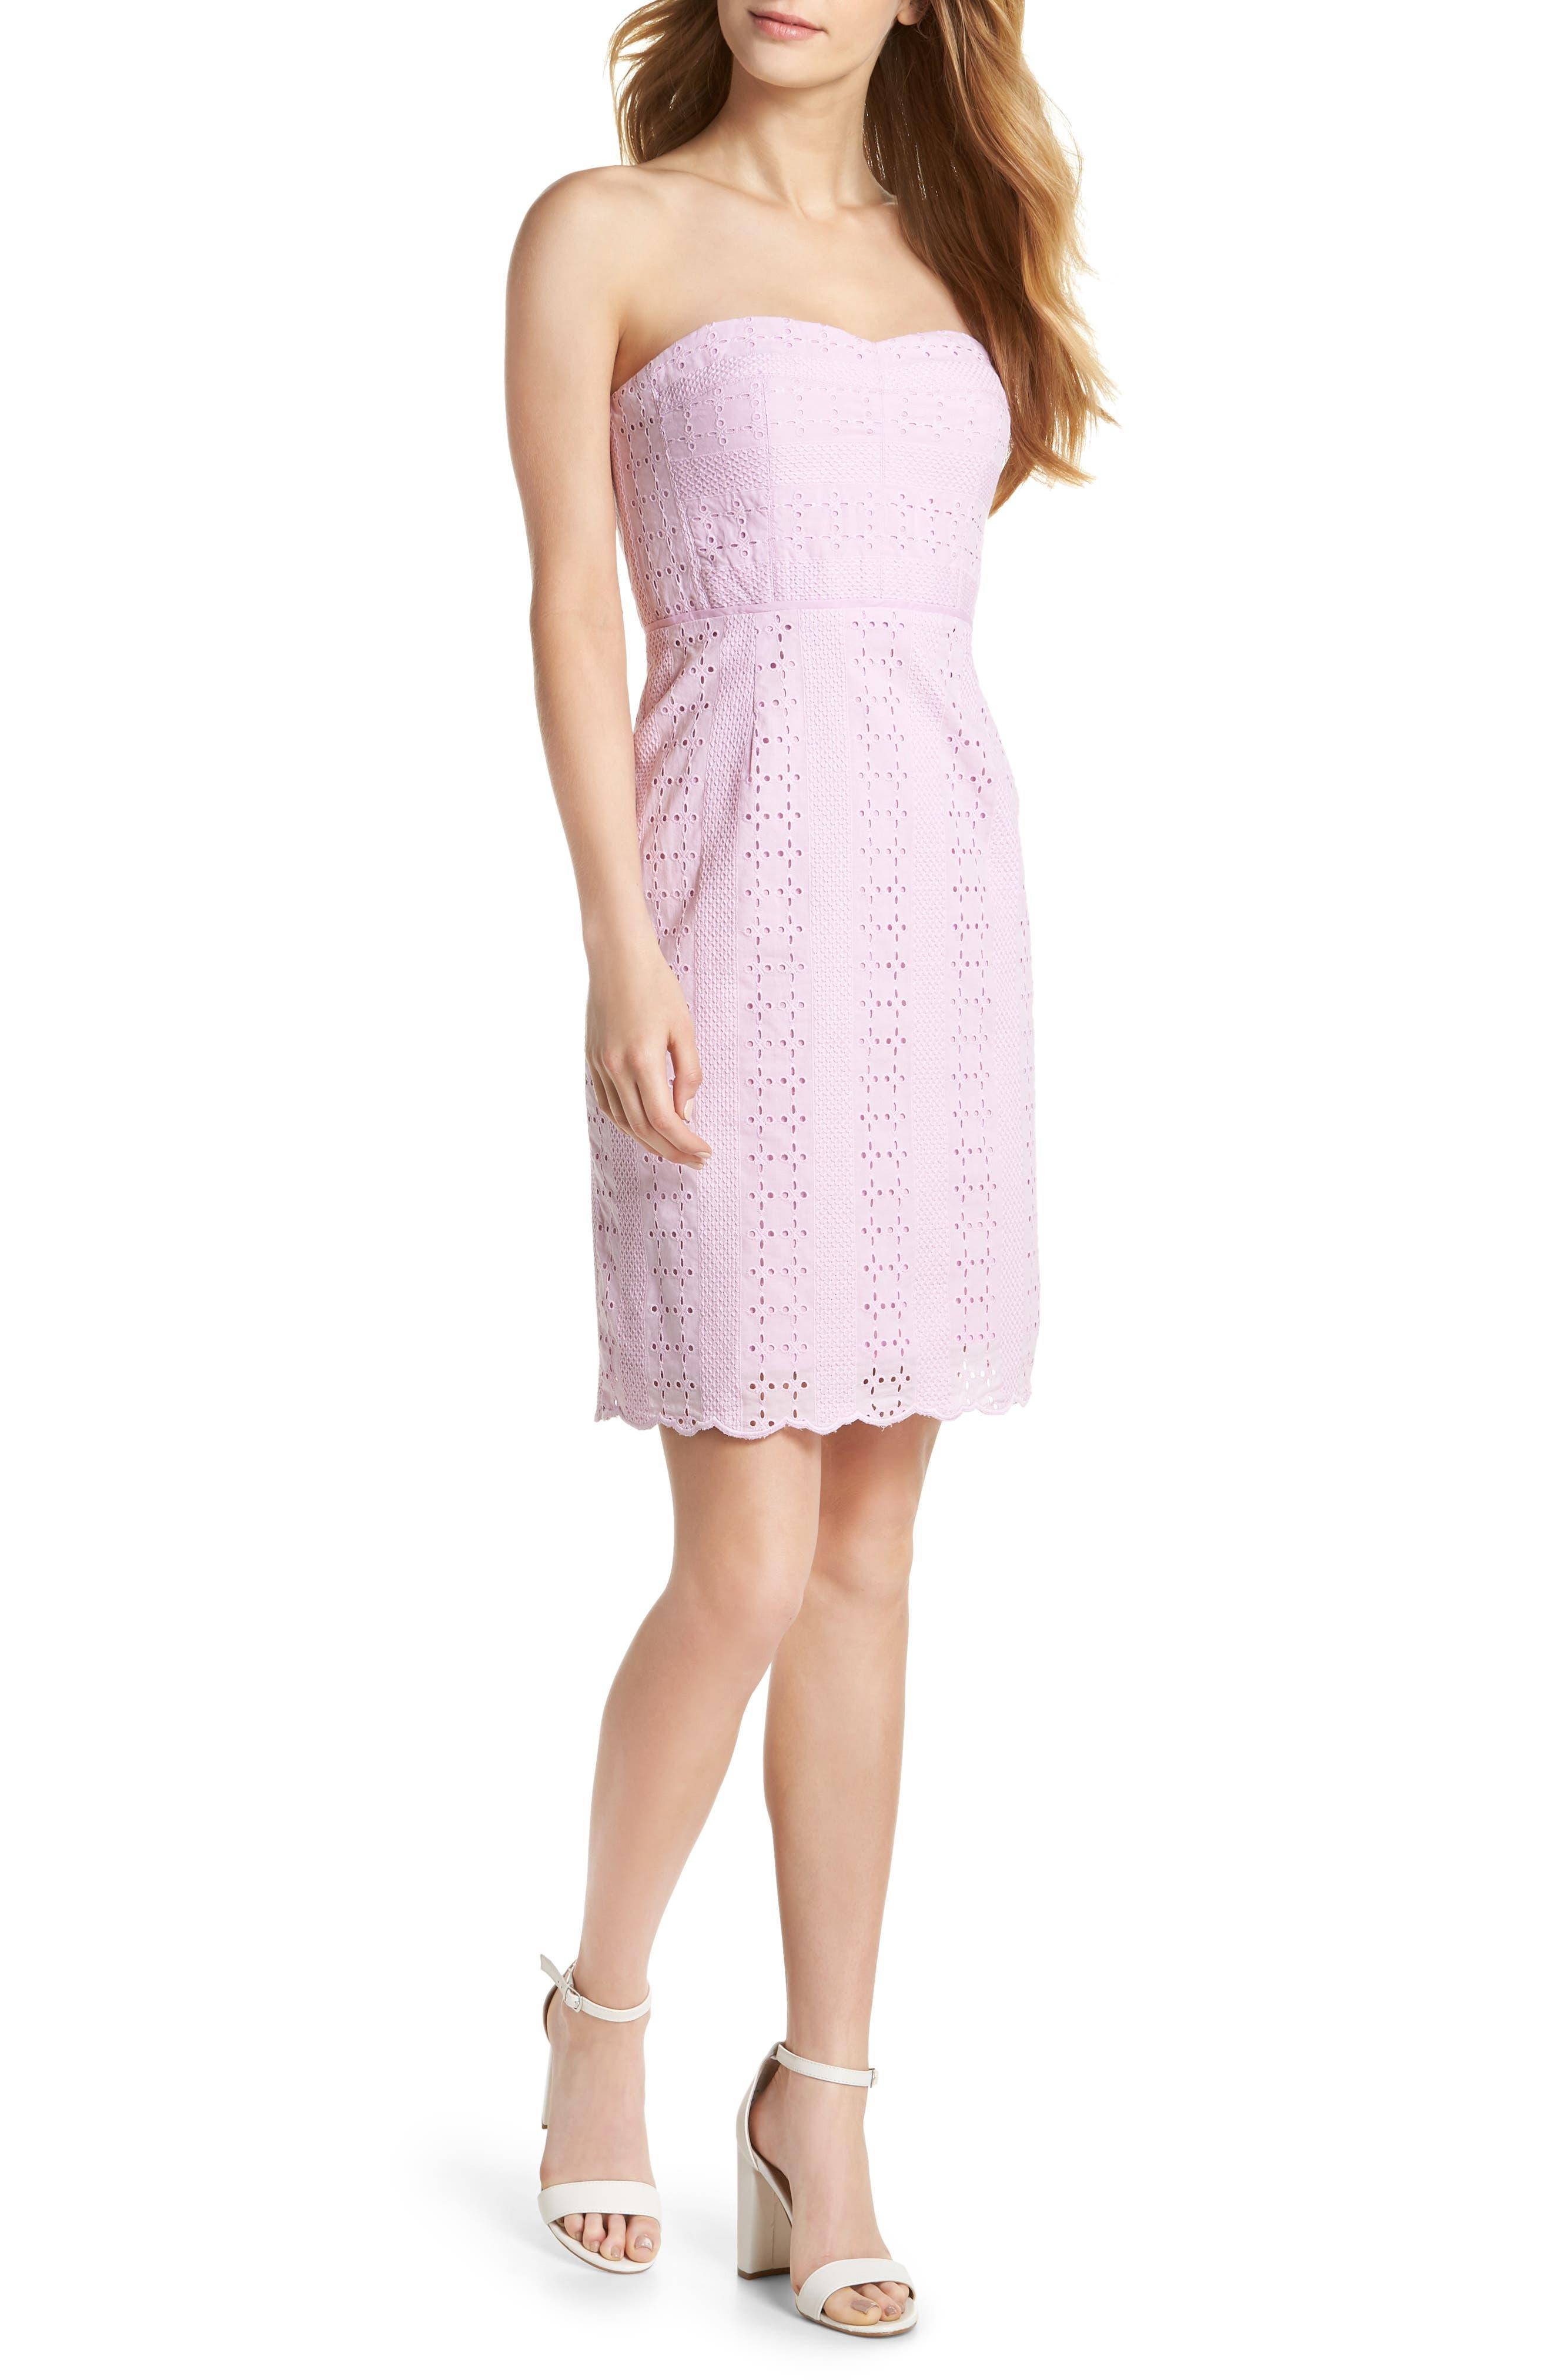 J.Crew Strapless Eyelet Sheath Dress,                         Main,                         color, Lavender Mist